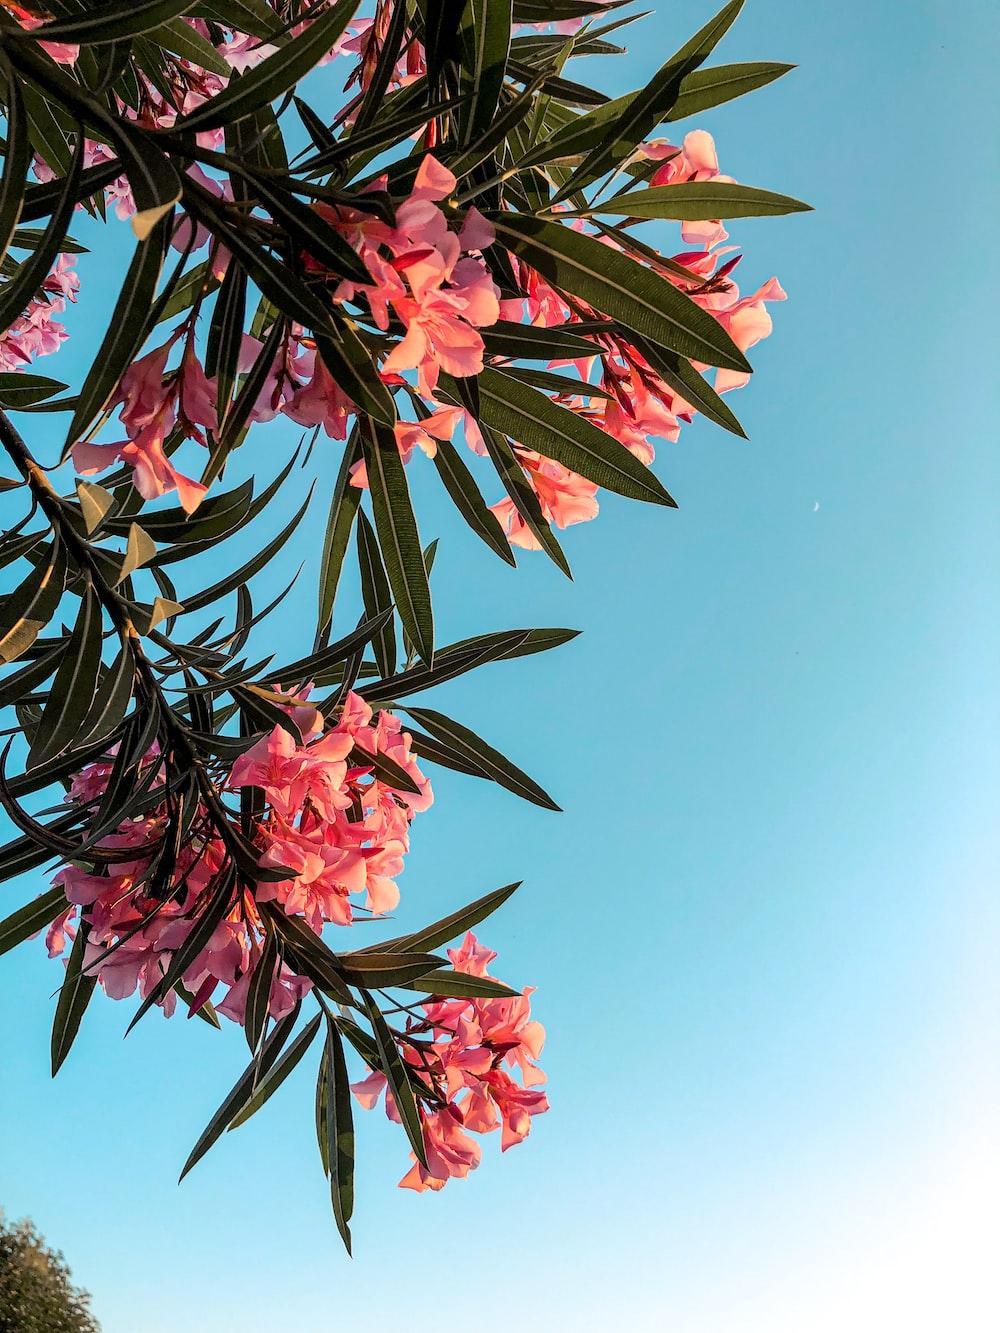 pink petaled green leafed flowering plant